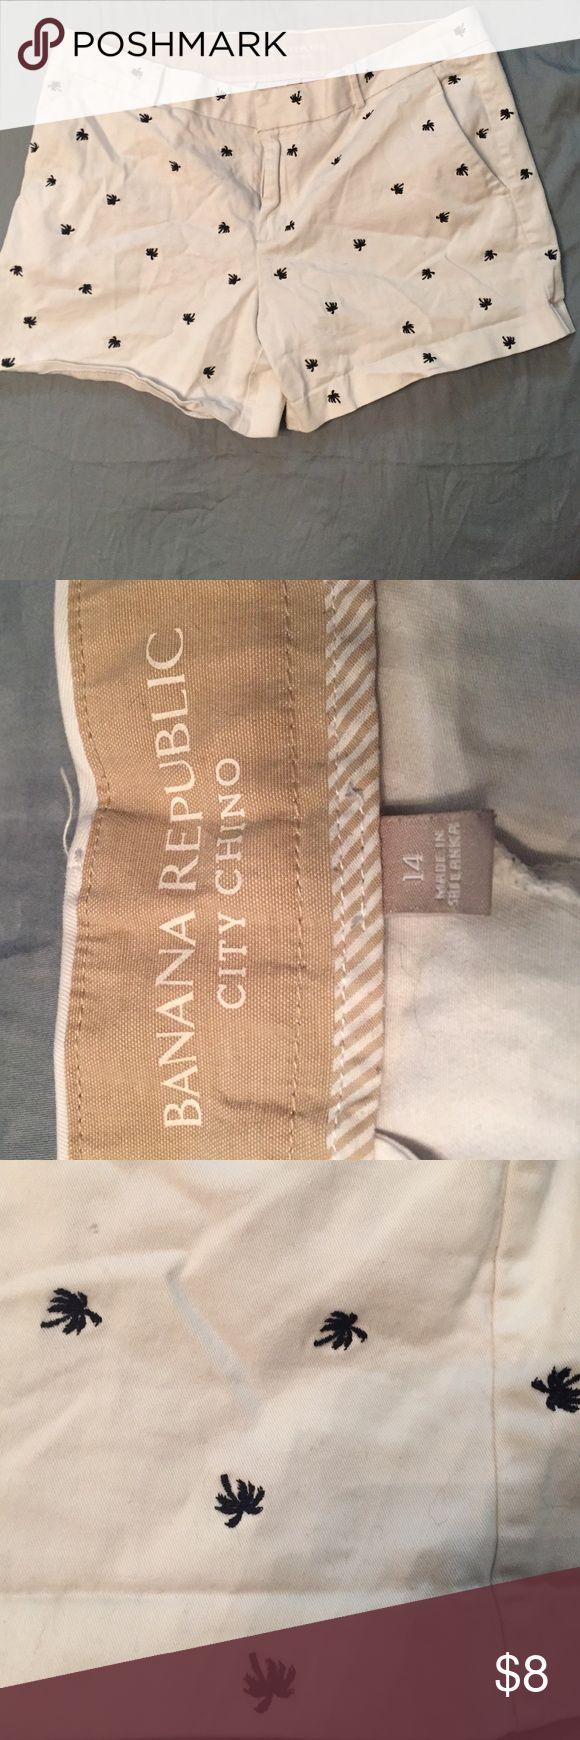 Banana Republic Shorts White with Navy Blue Palm Trees Banana Republic Shorts